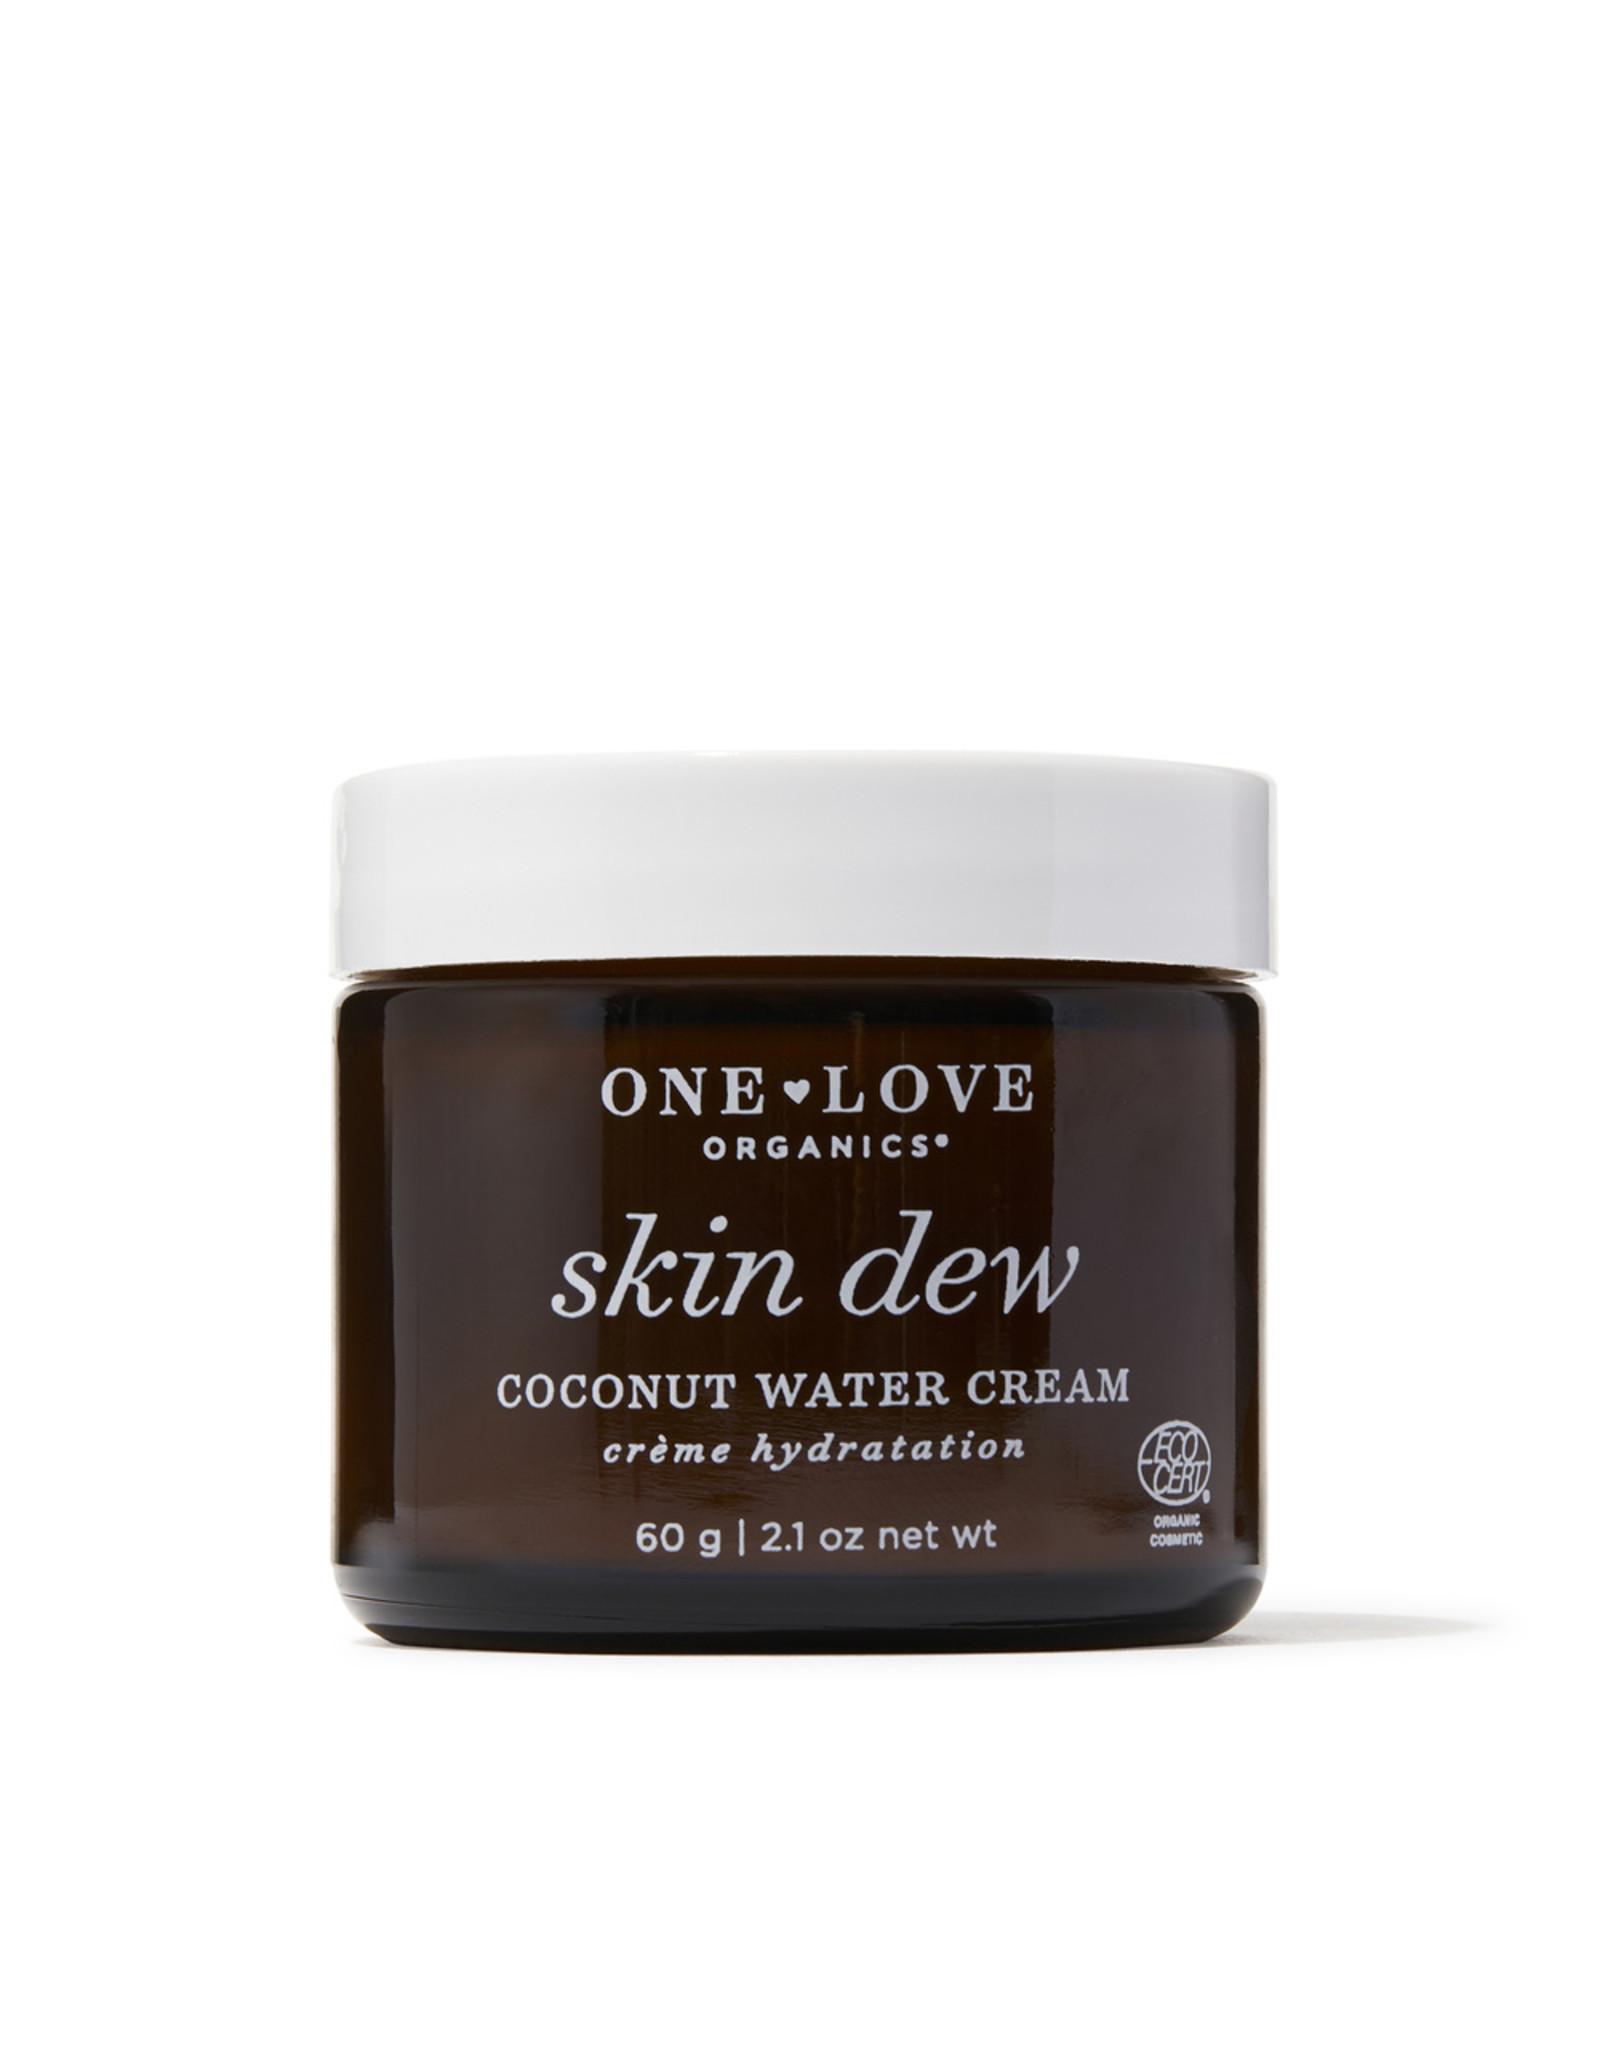 One Love Organics One Love Organics Skin Dew Coconut Water Cream